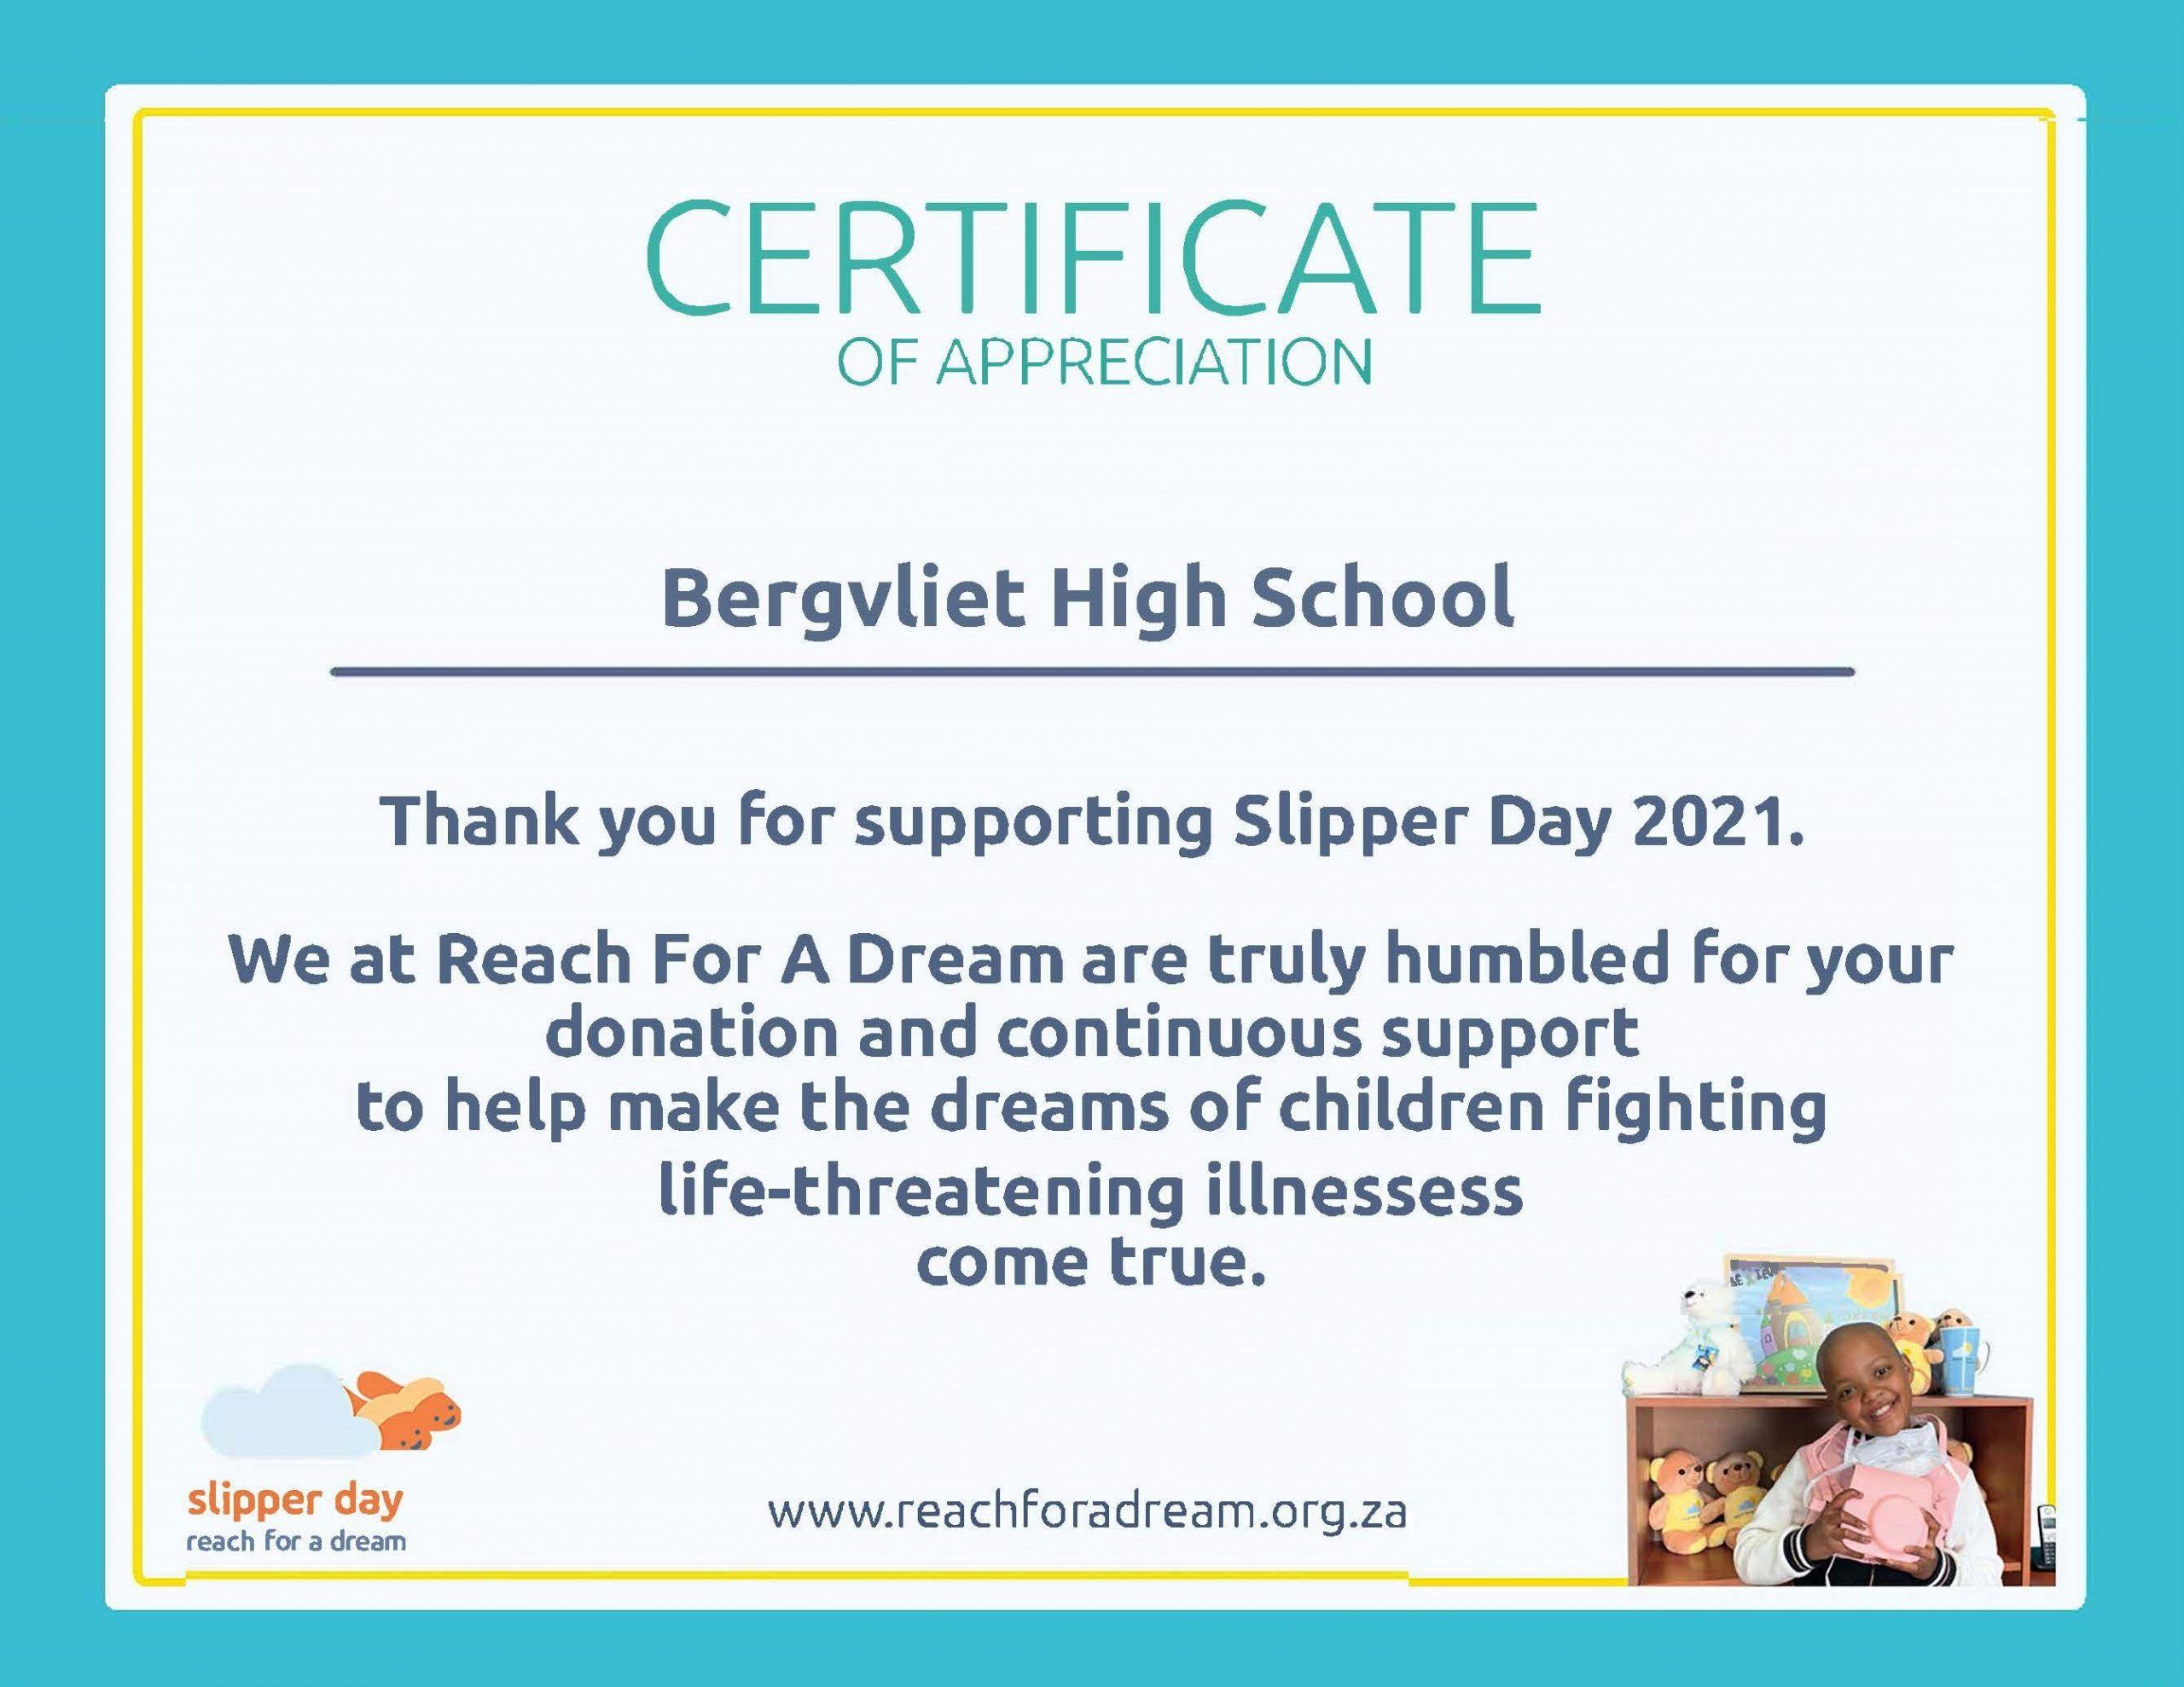 Slipper Day 2021